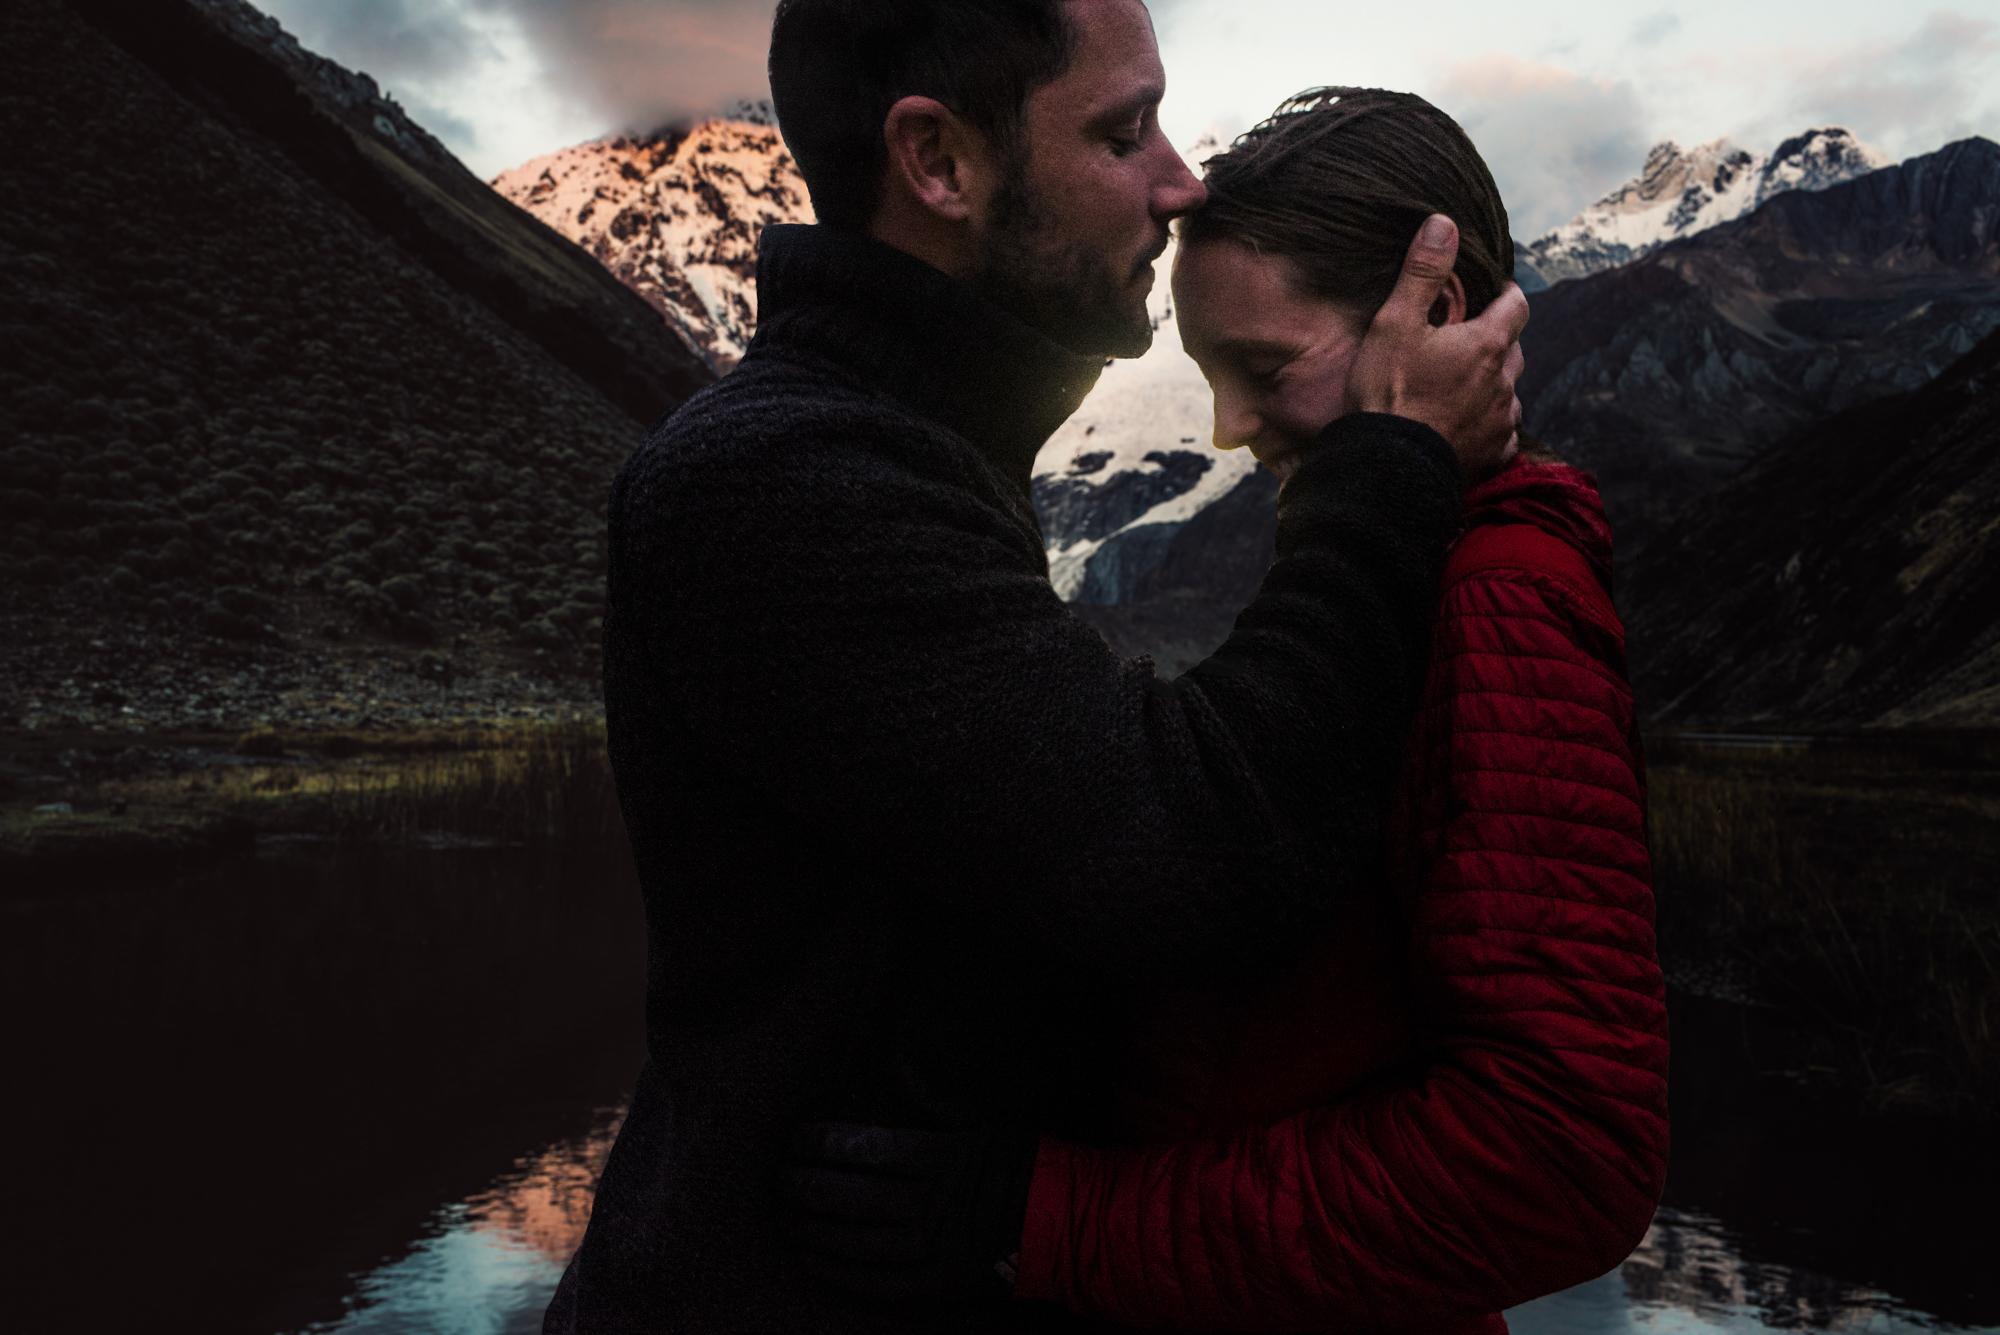 Damian+and+Jesse+Engagement+Session+Huayhuash+Mountain+Trekking+Peru_1.JPG